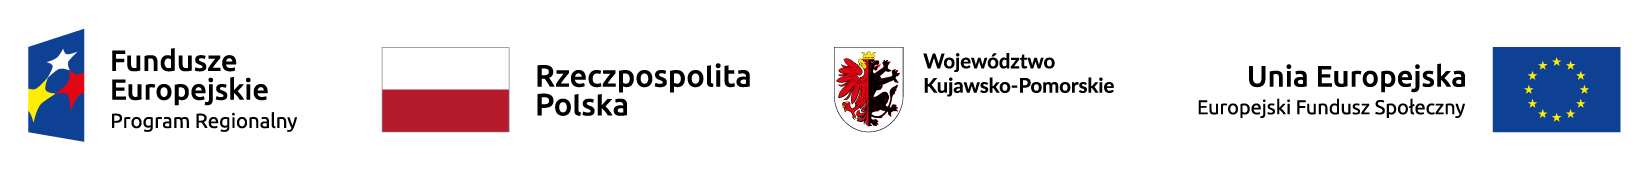 Projekt UE Logotypy